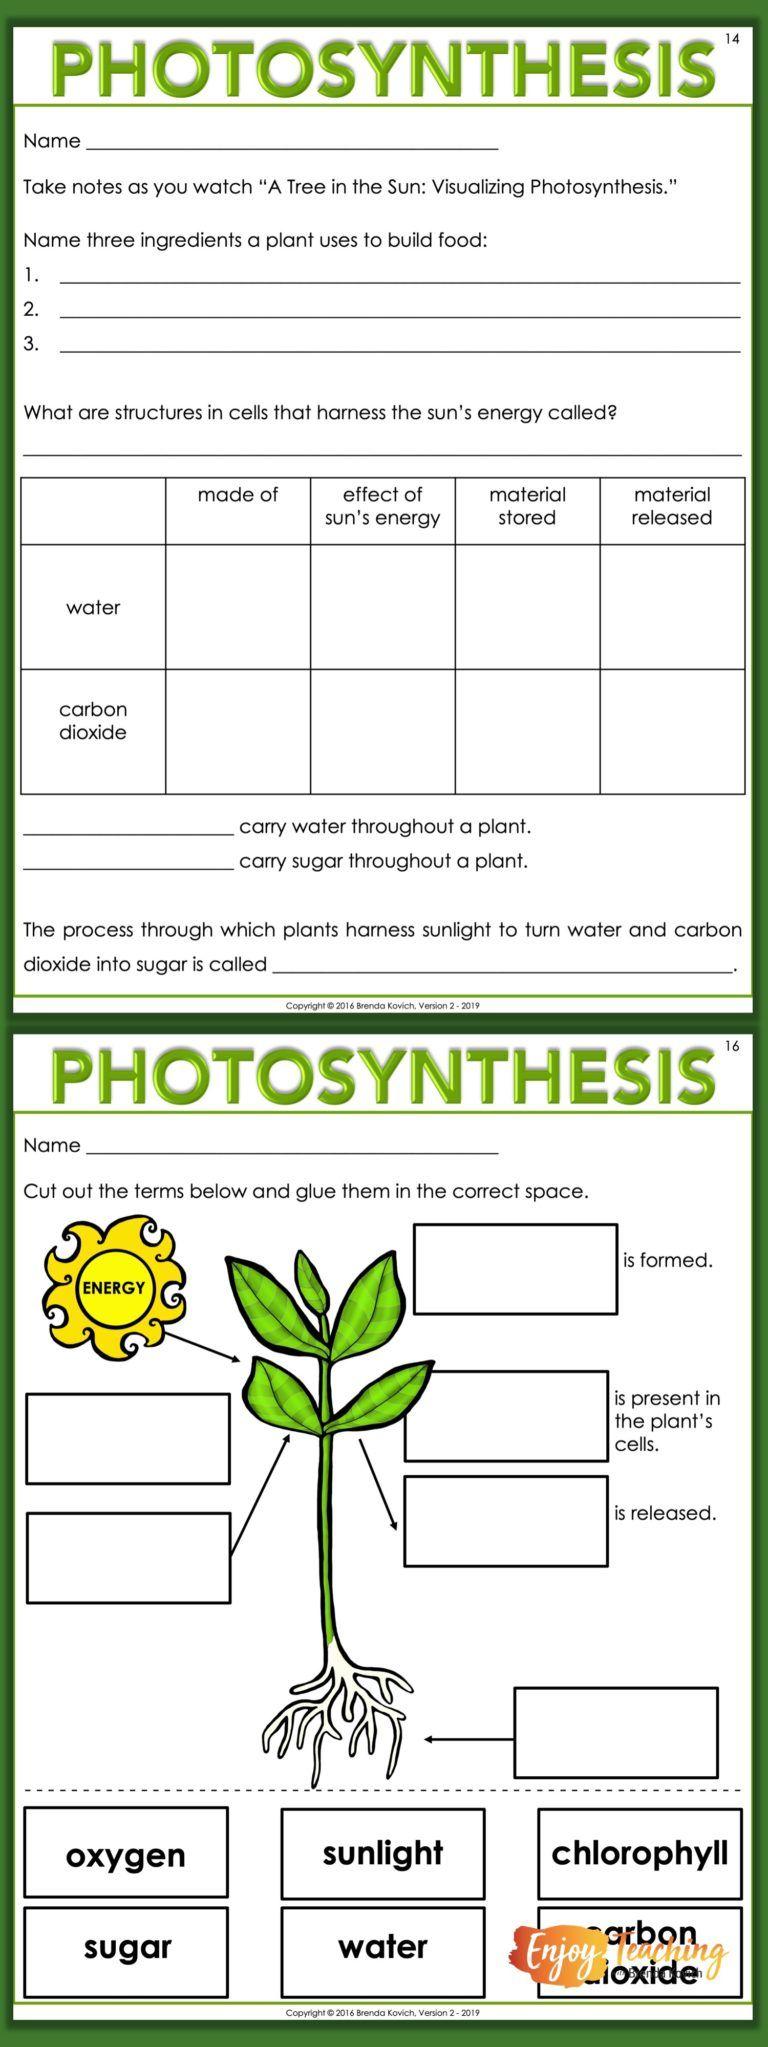 Enjoy Teaching Plants With Biology Activities For Kids Photosynthesis Activities Photosynthesis Worksheet Biology Activity